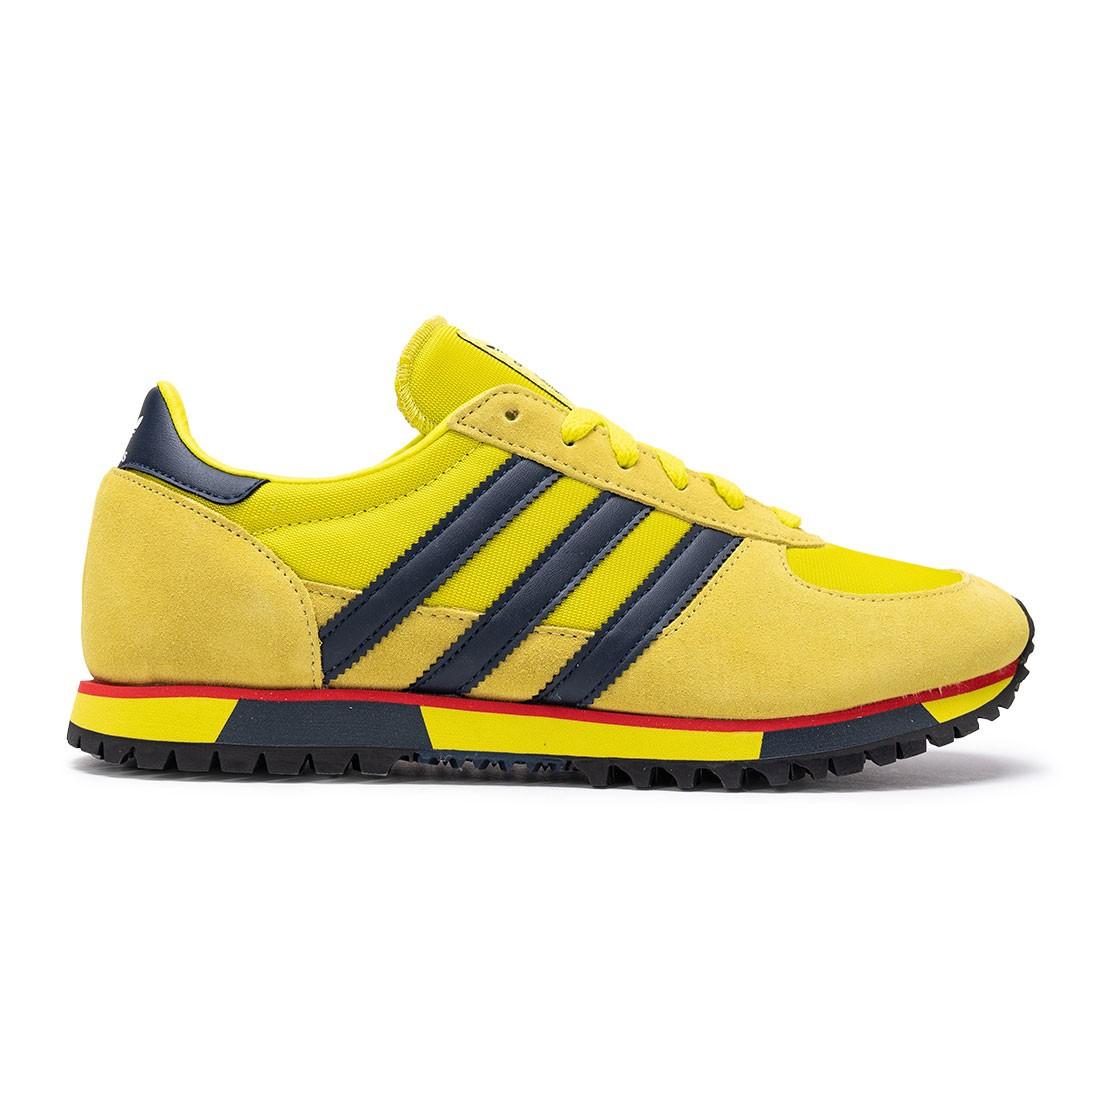 Adidas MenMarathon 86 SPZL (yellow / shock slime / collegiate navy / yellow spice)